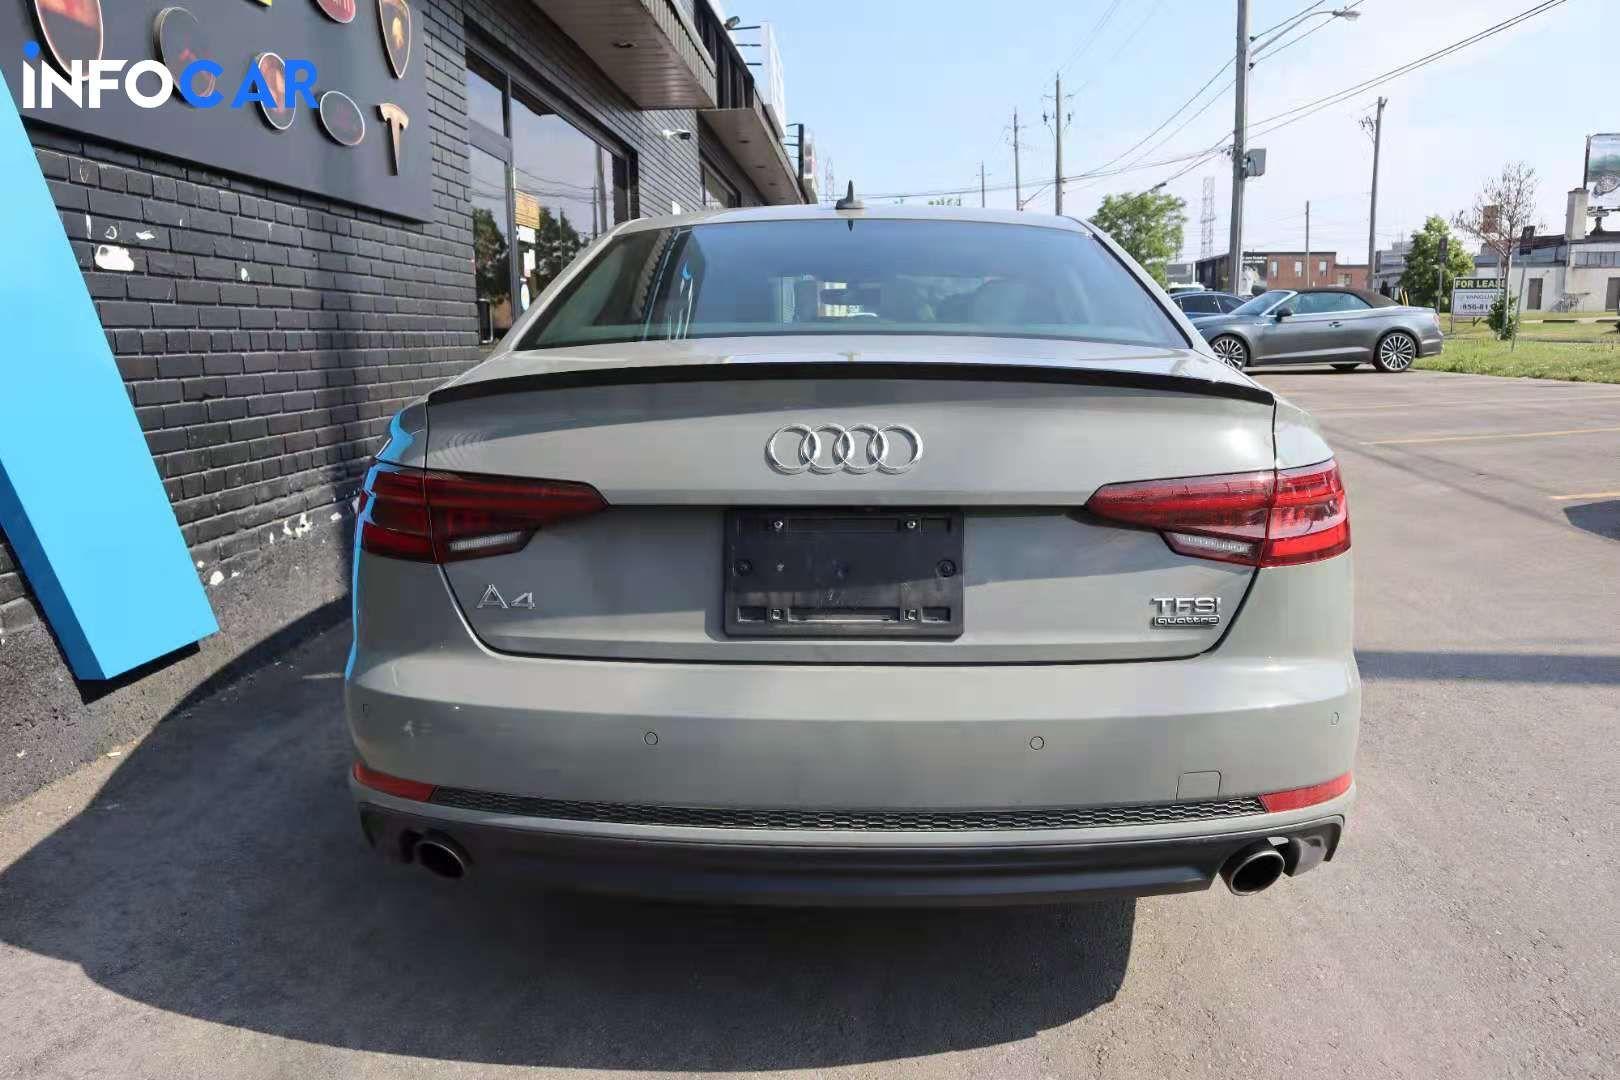 2018 Audi A4 prgressive - INFOCAR - Toronto's Most Comprehensive New and Used Auto Trading Platform